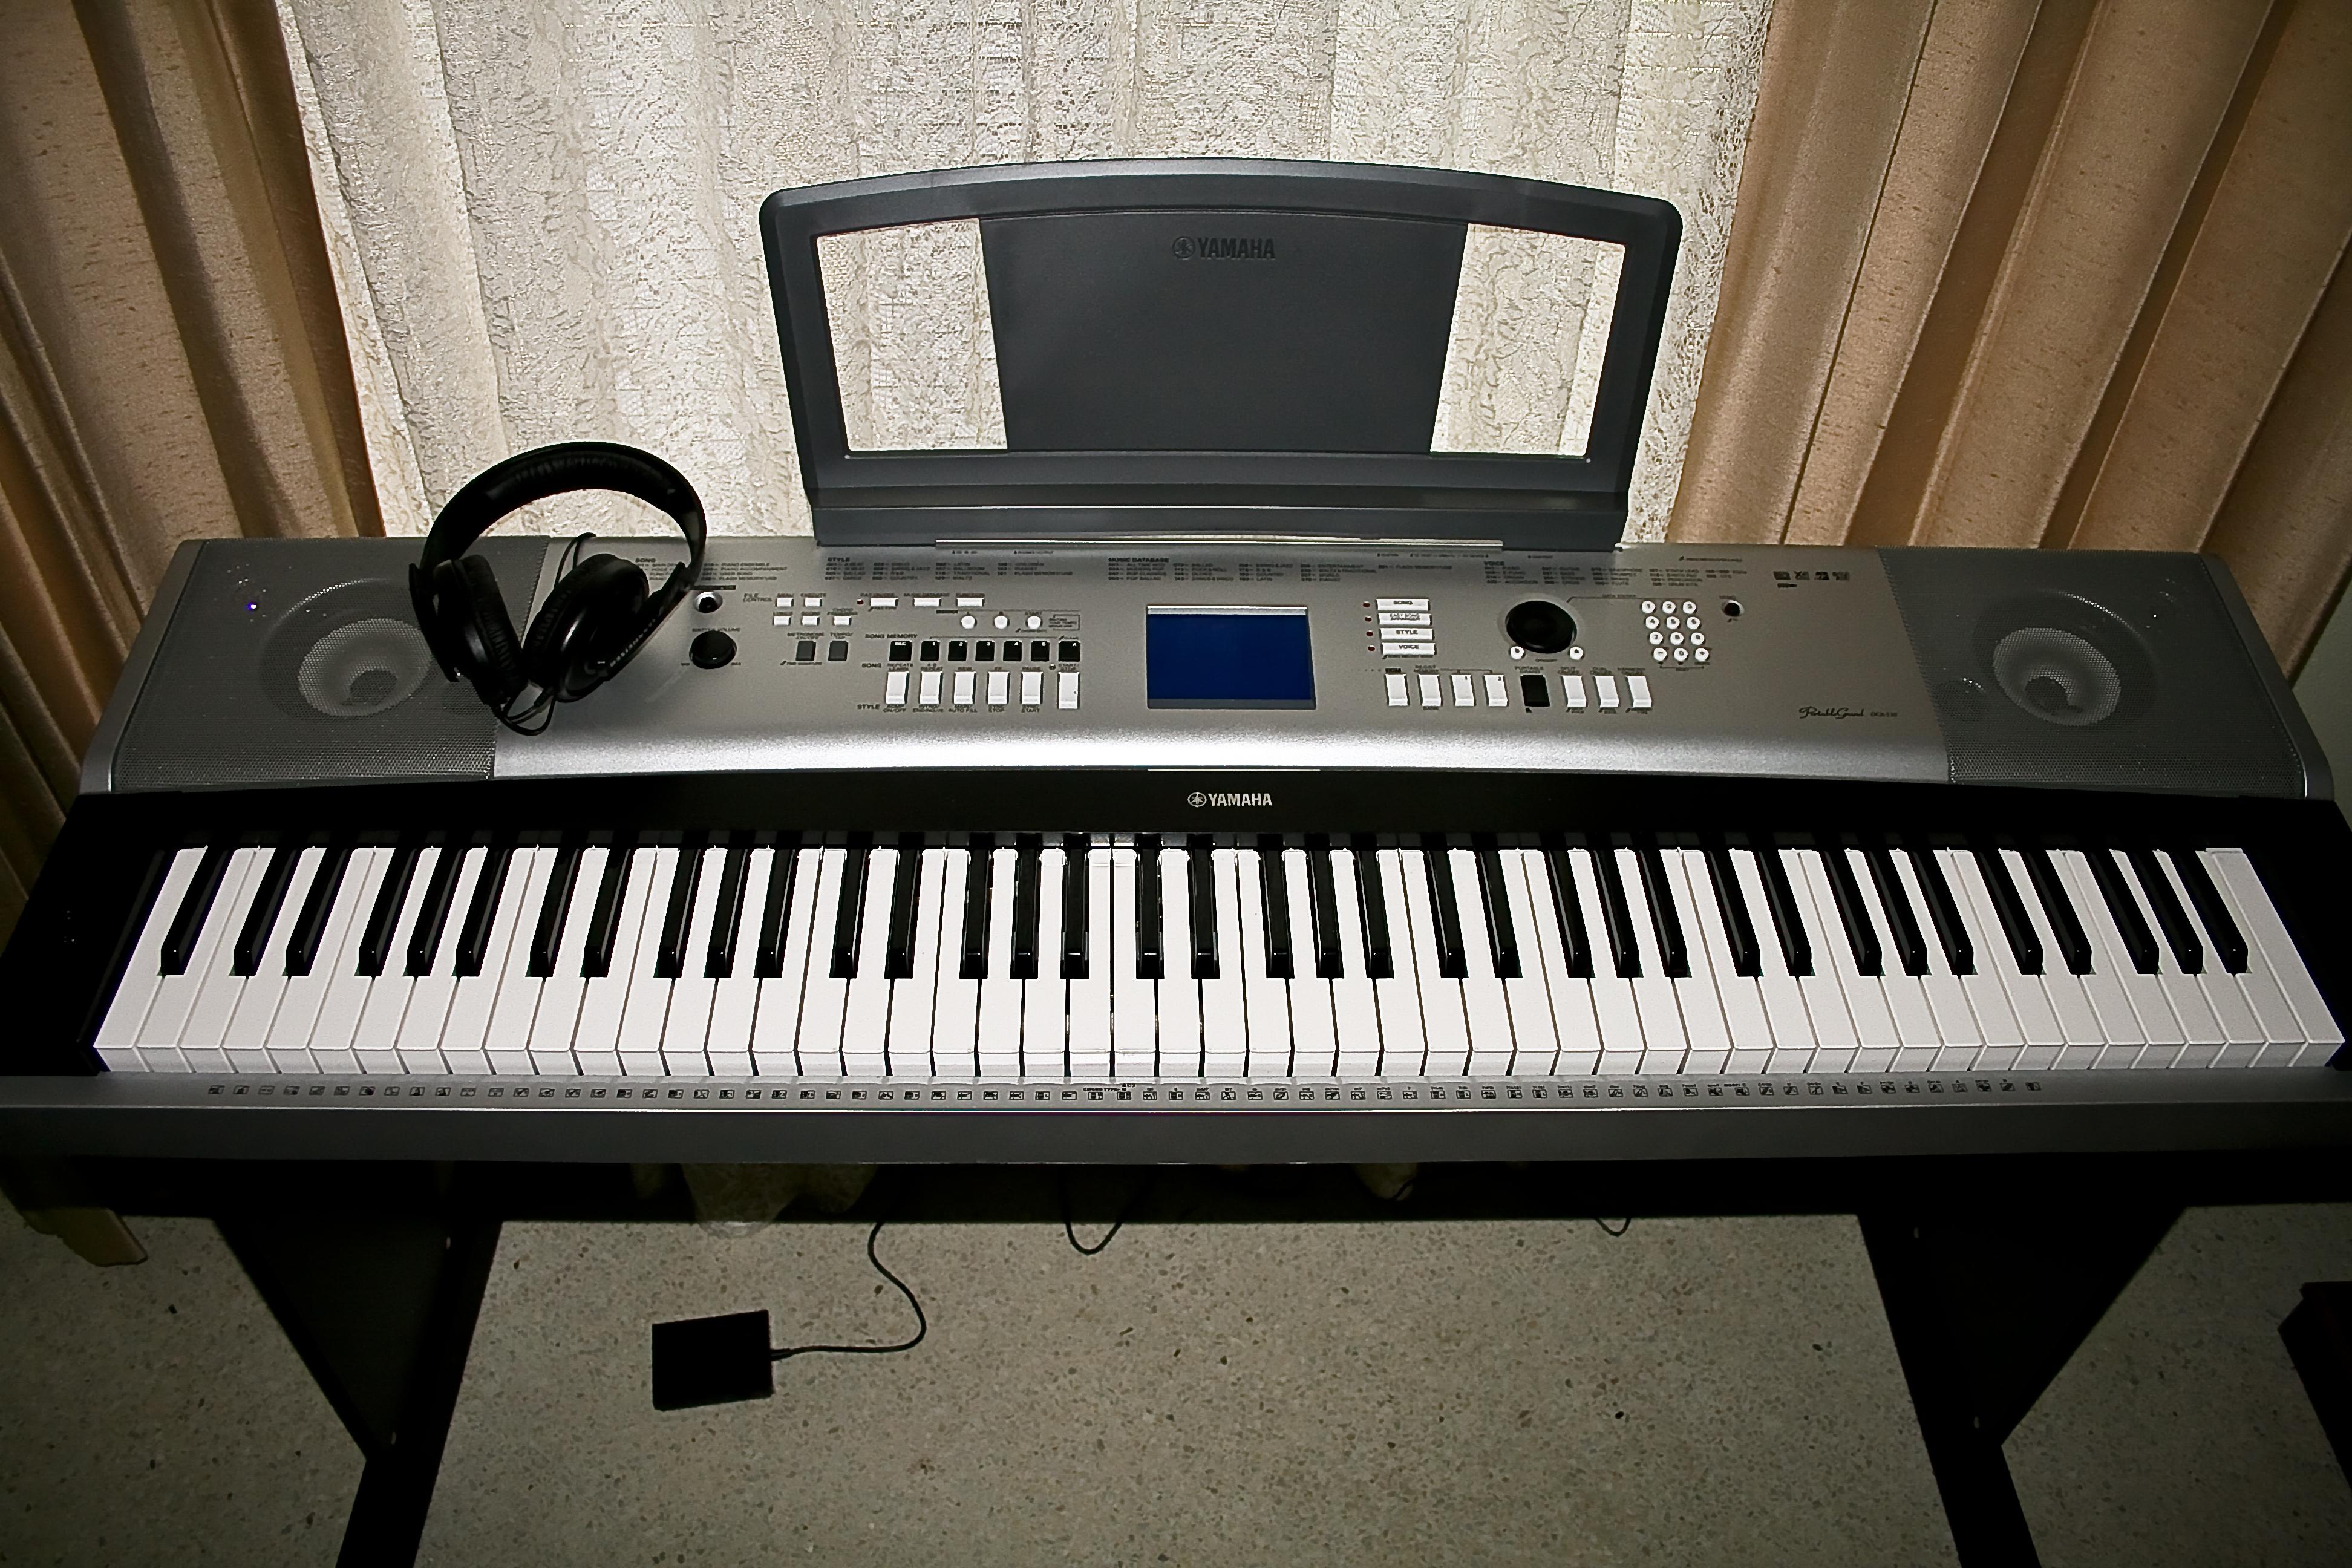 Yamaha dgx 530 88 key portable grand piano keyboard for Yamaha 88 keyboard